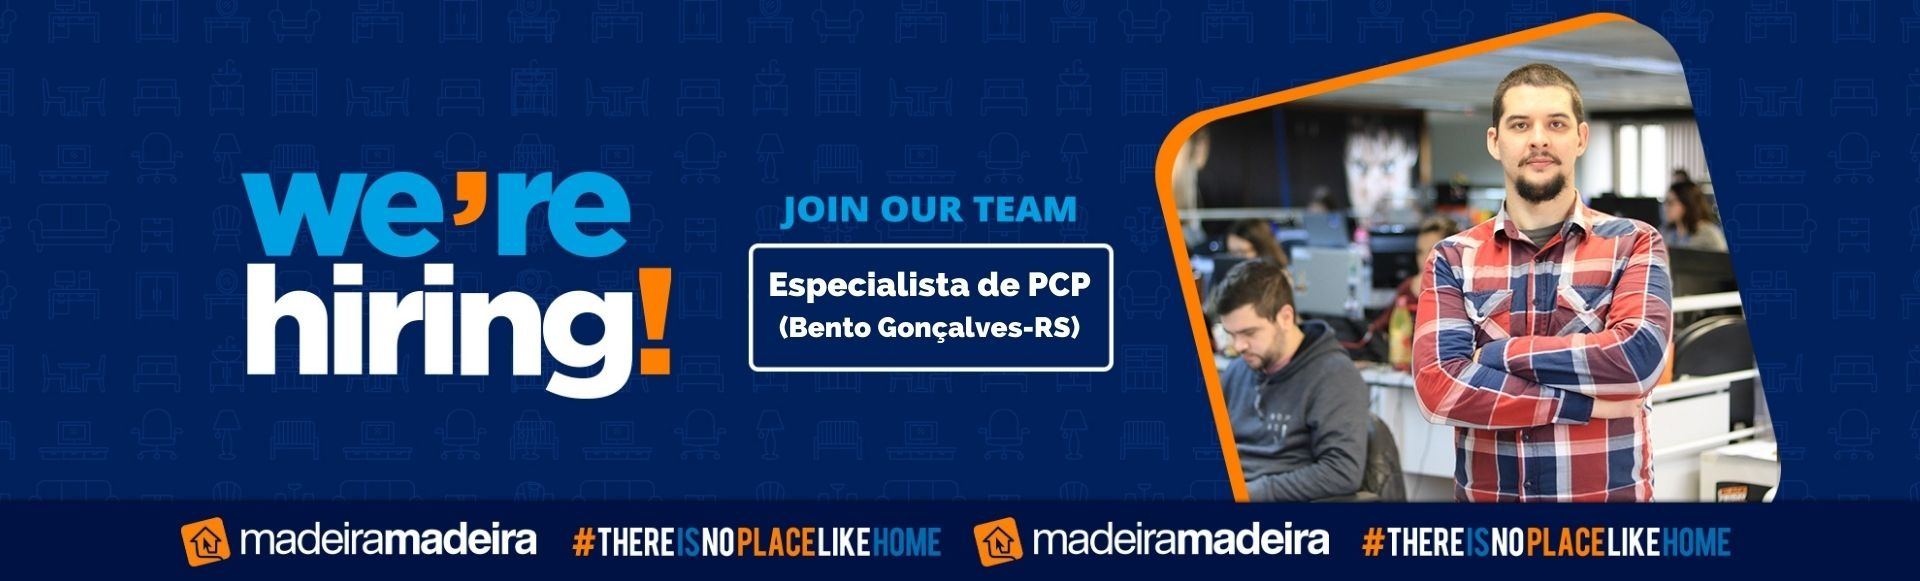 Especialista de PCP (Bento Gonçalves-RS)